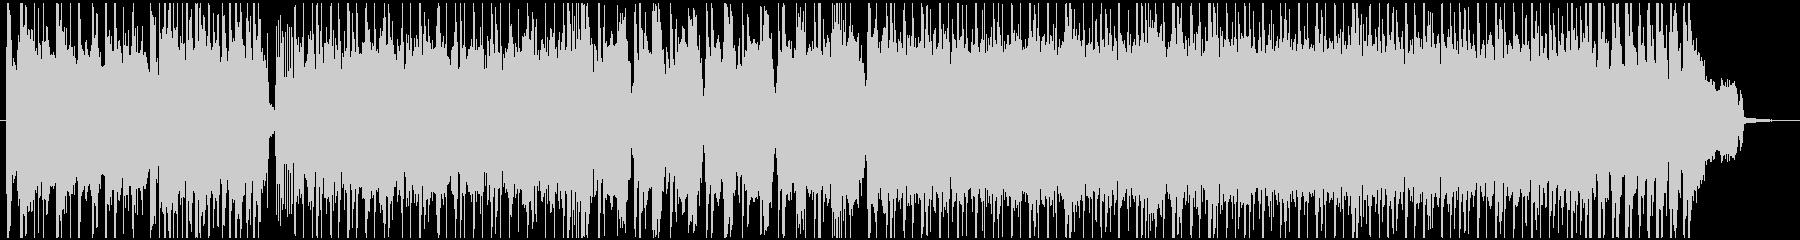 gimmeMASK の未再生の波形